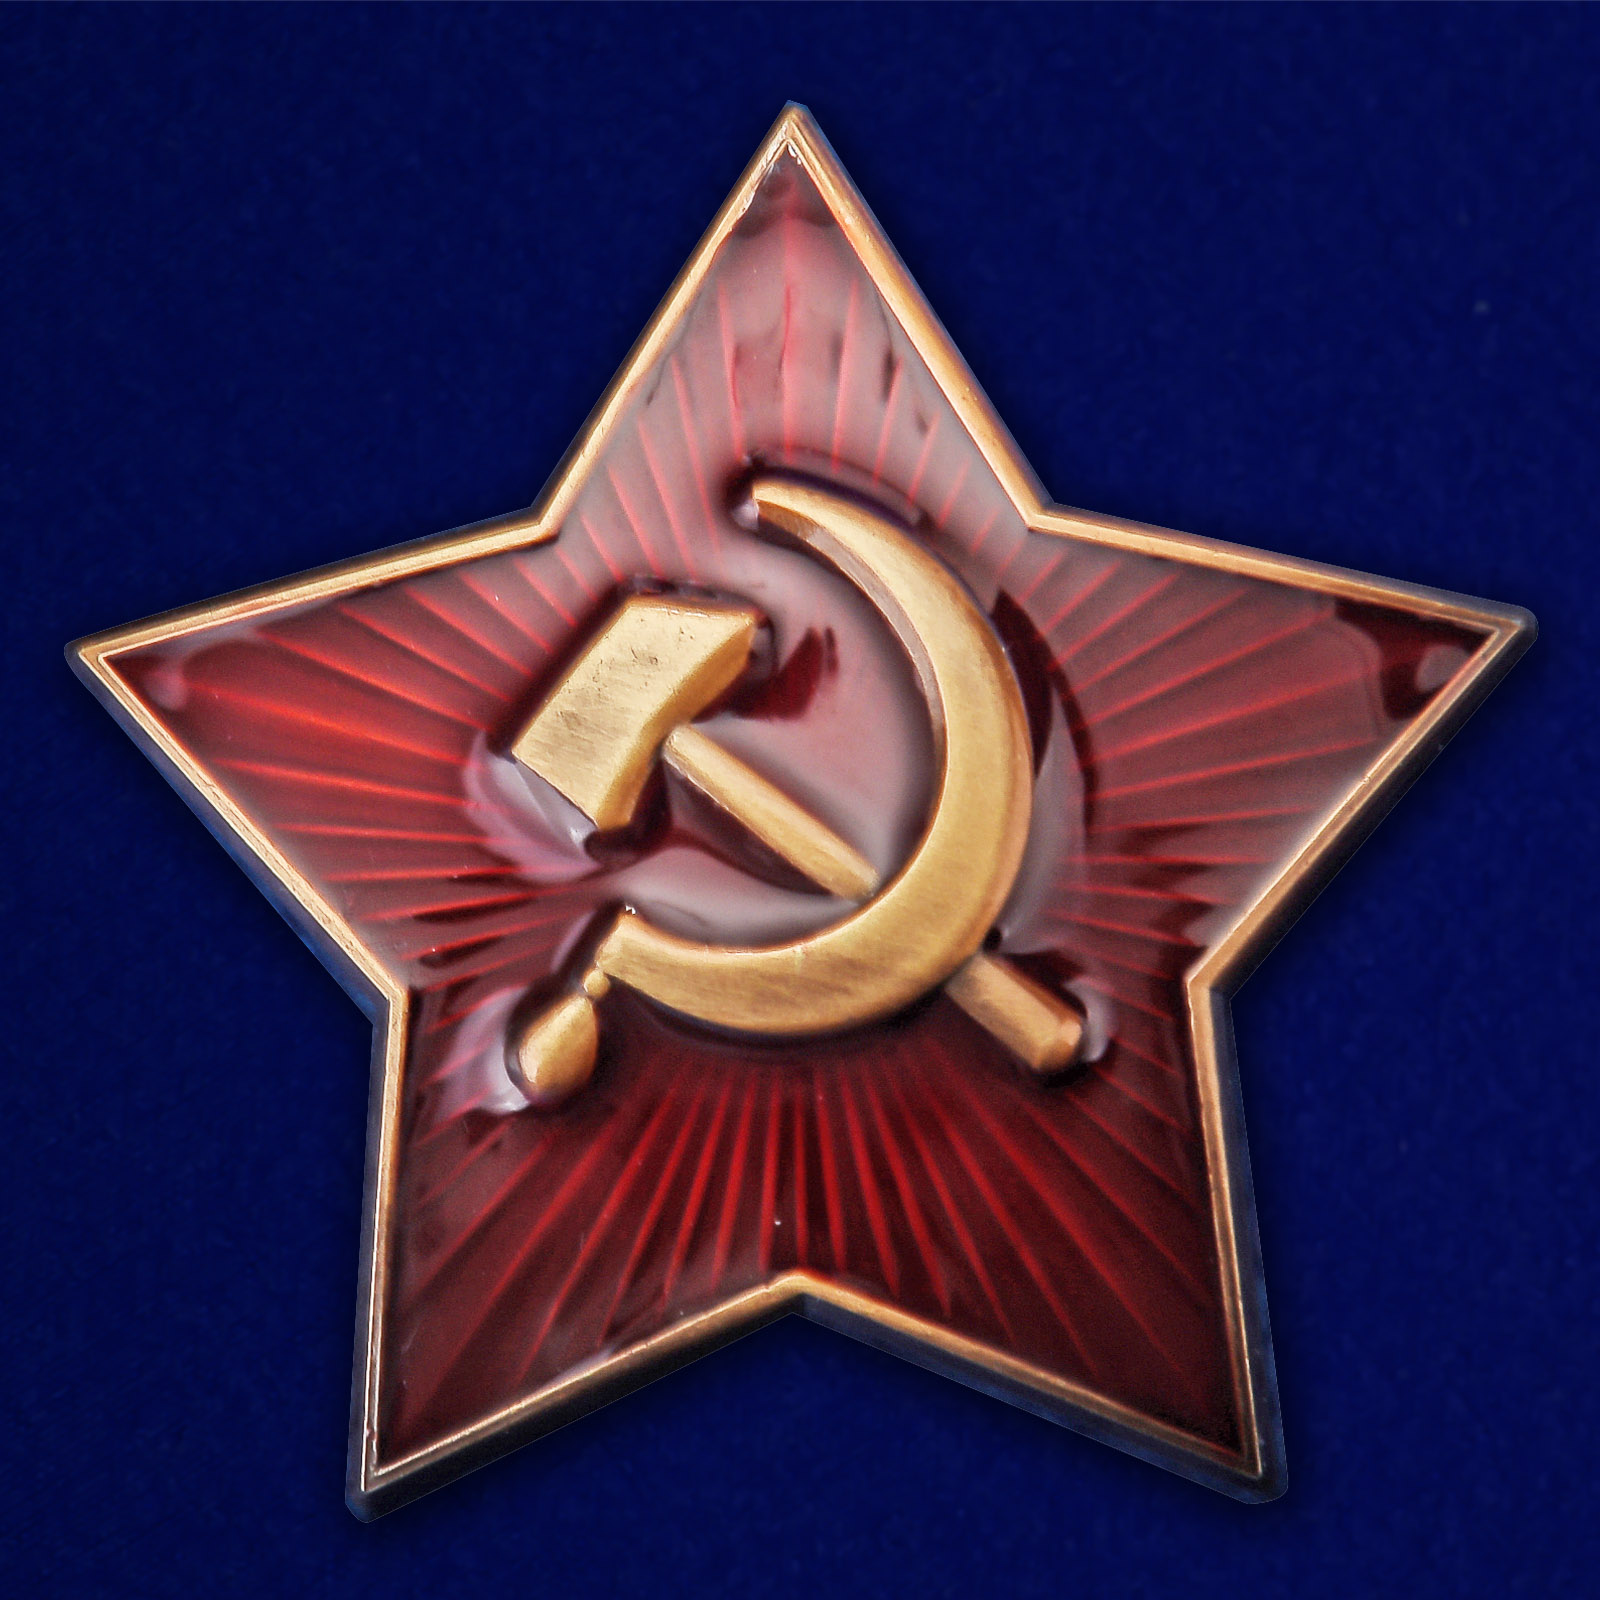 Латунная звезда кокарда РККА 1922 г. - общий вид